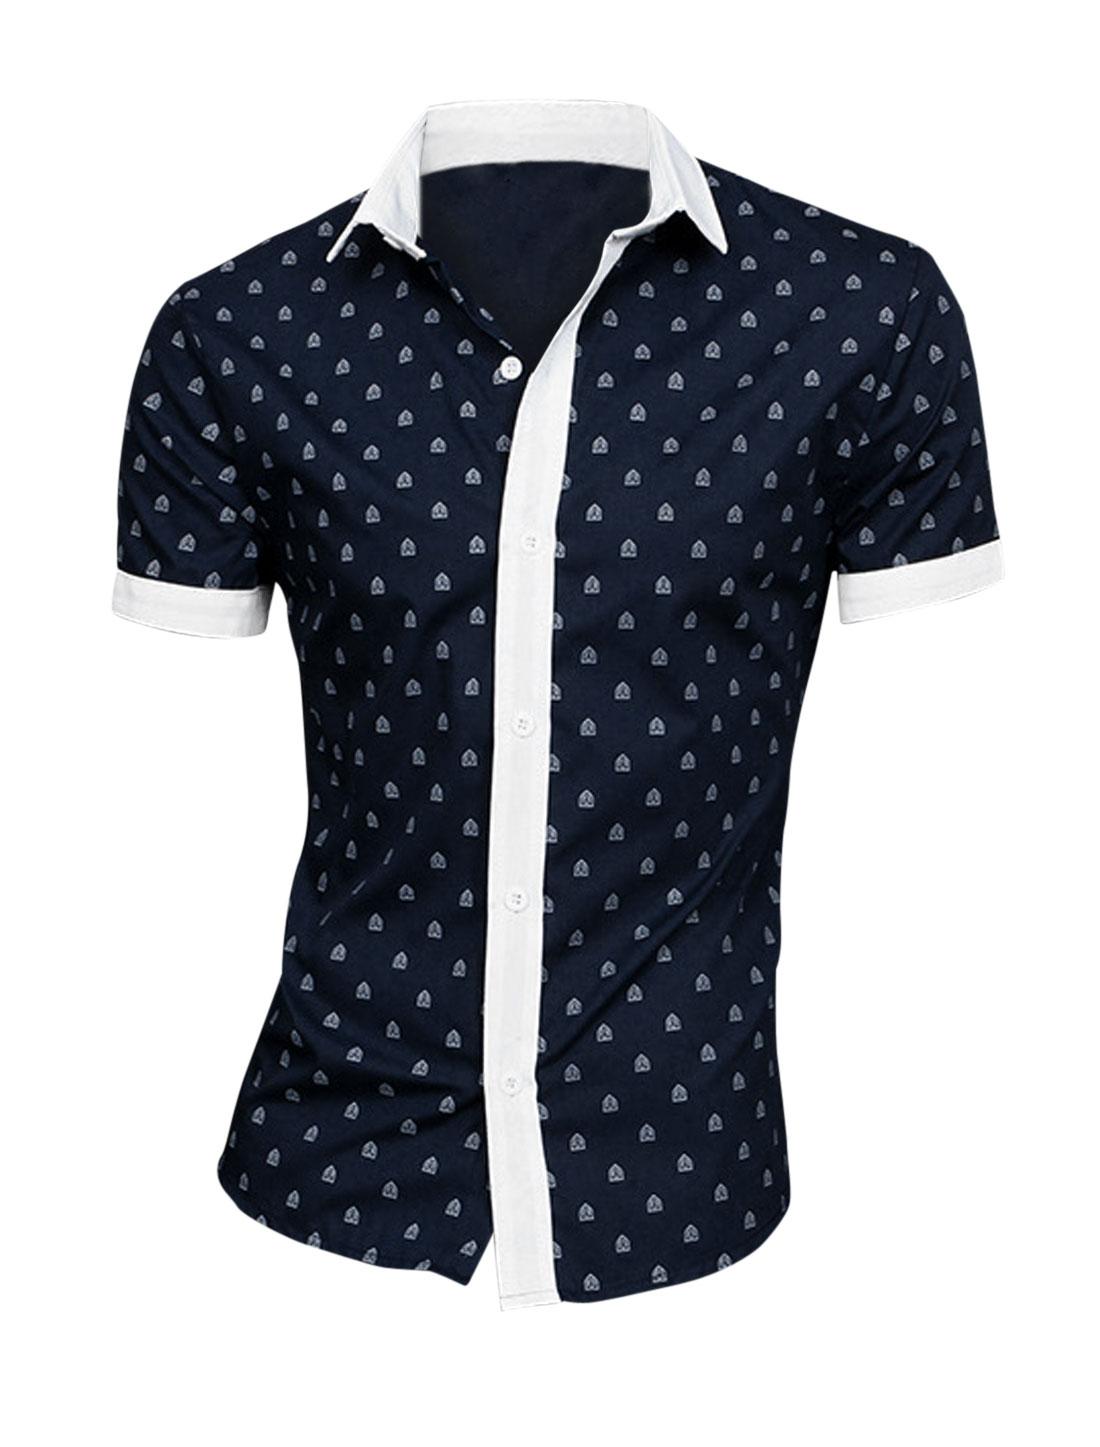 Men Shield Pattern Buttons Up Closure Stylish Shirt Navy Blue M